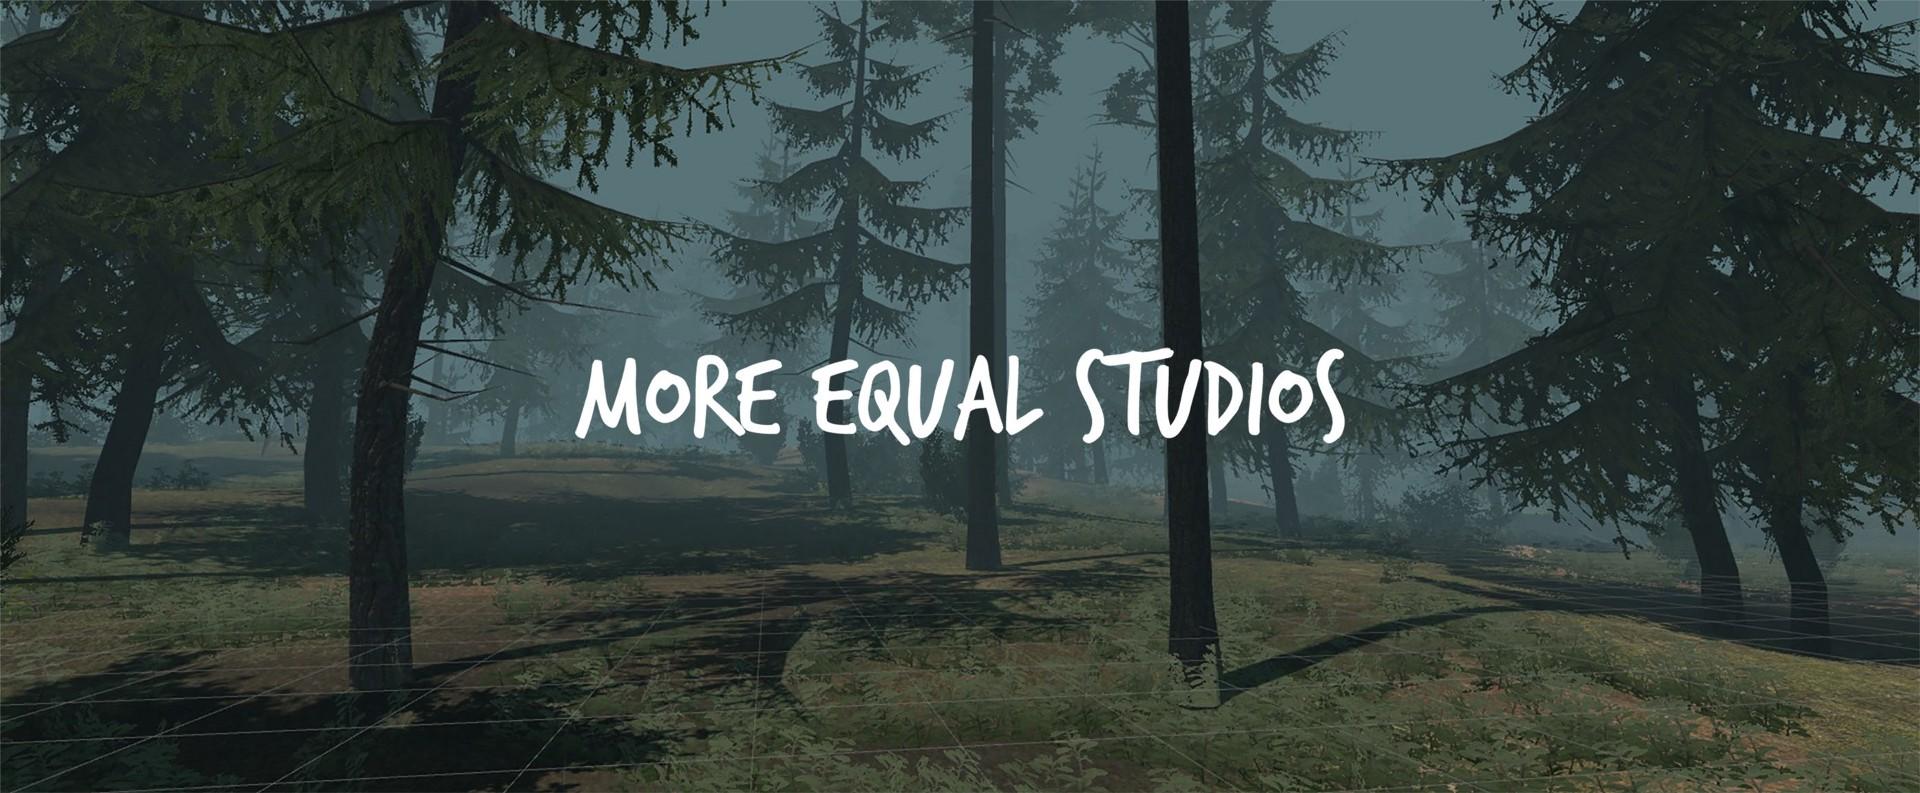 More Equal Studios